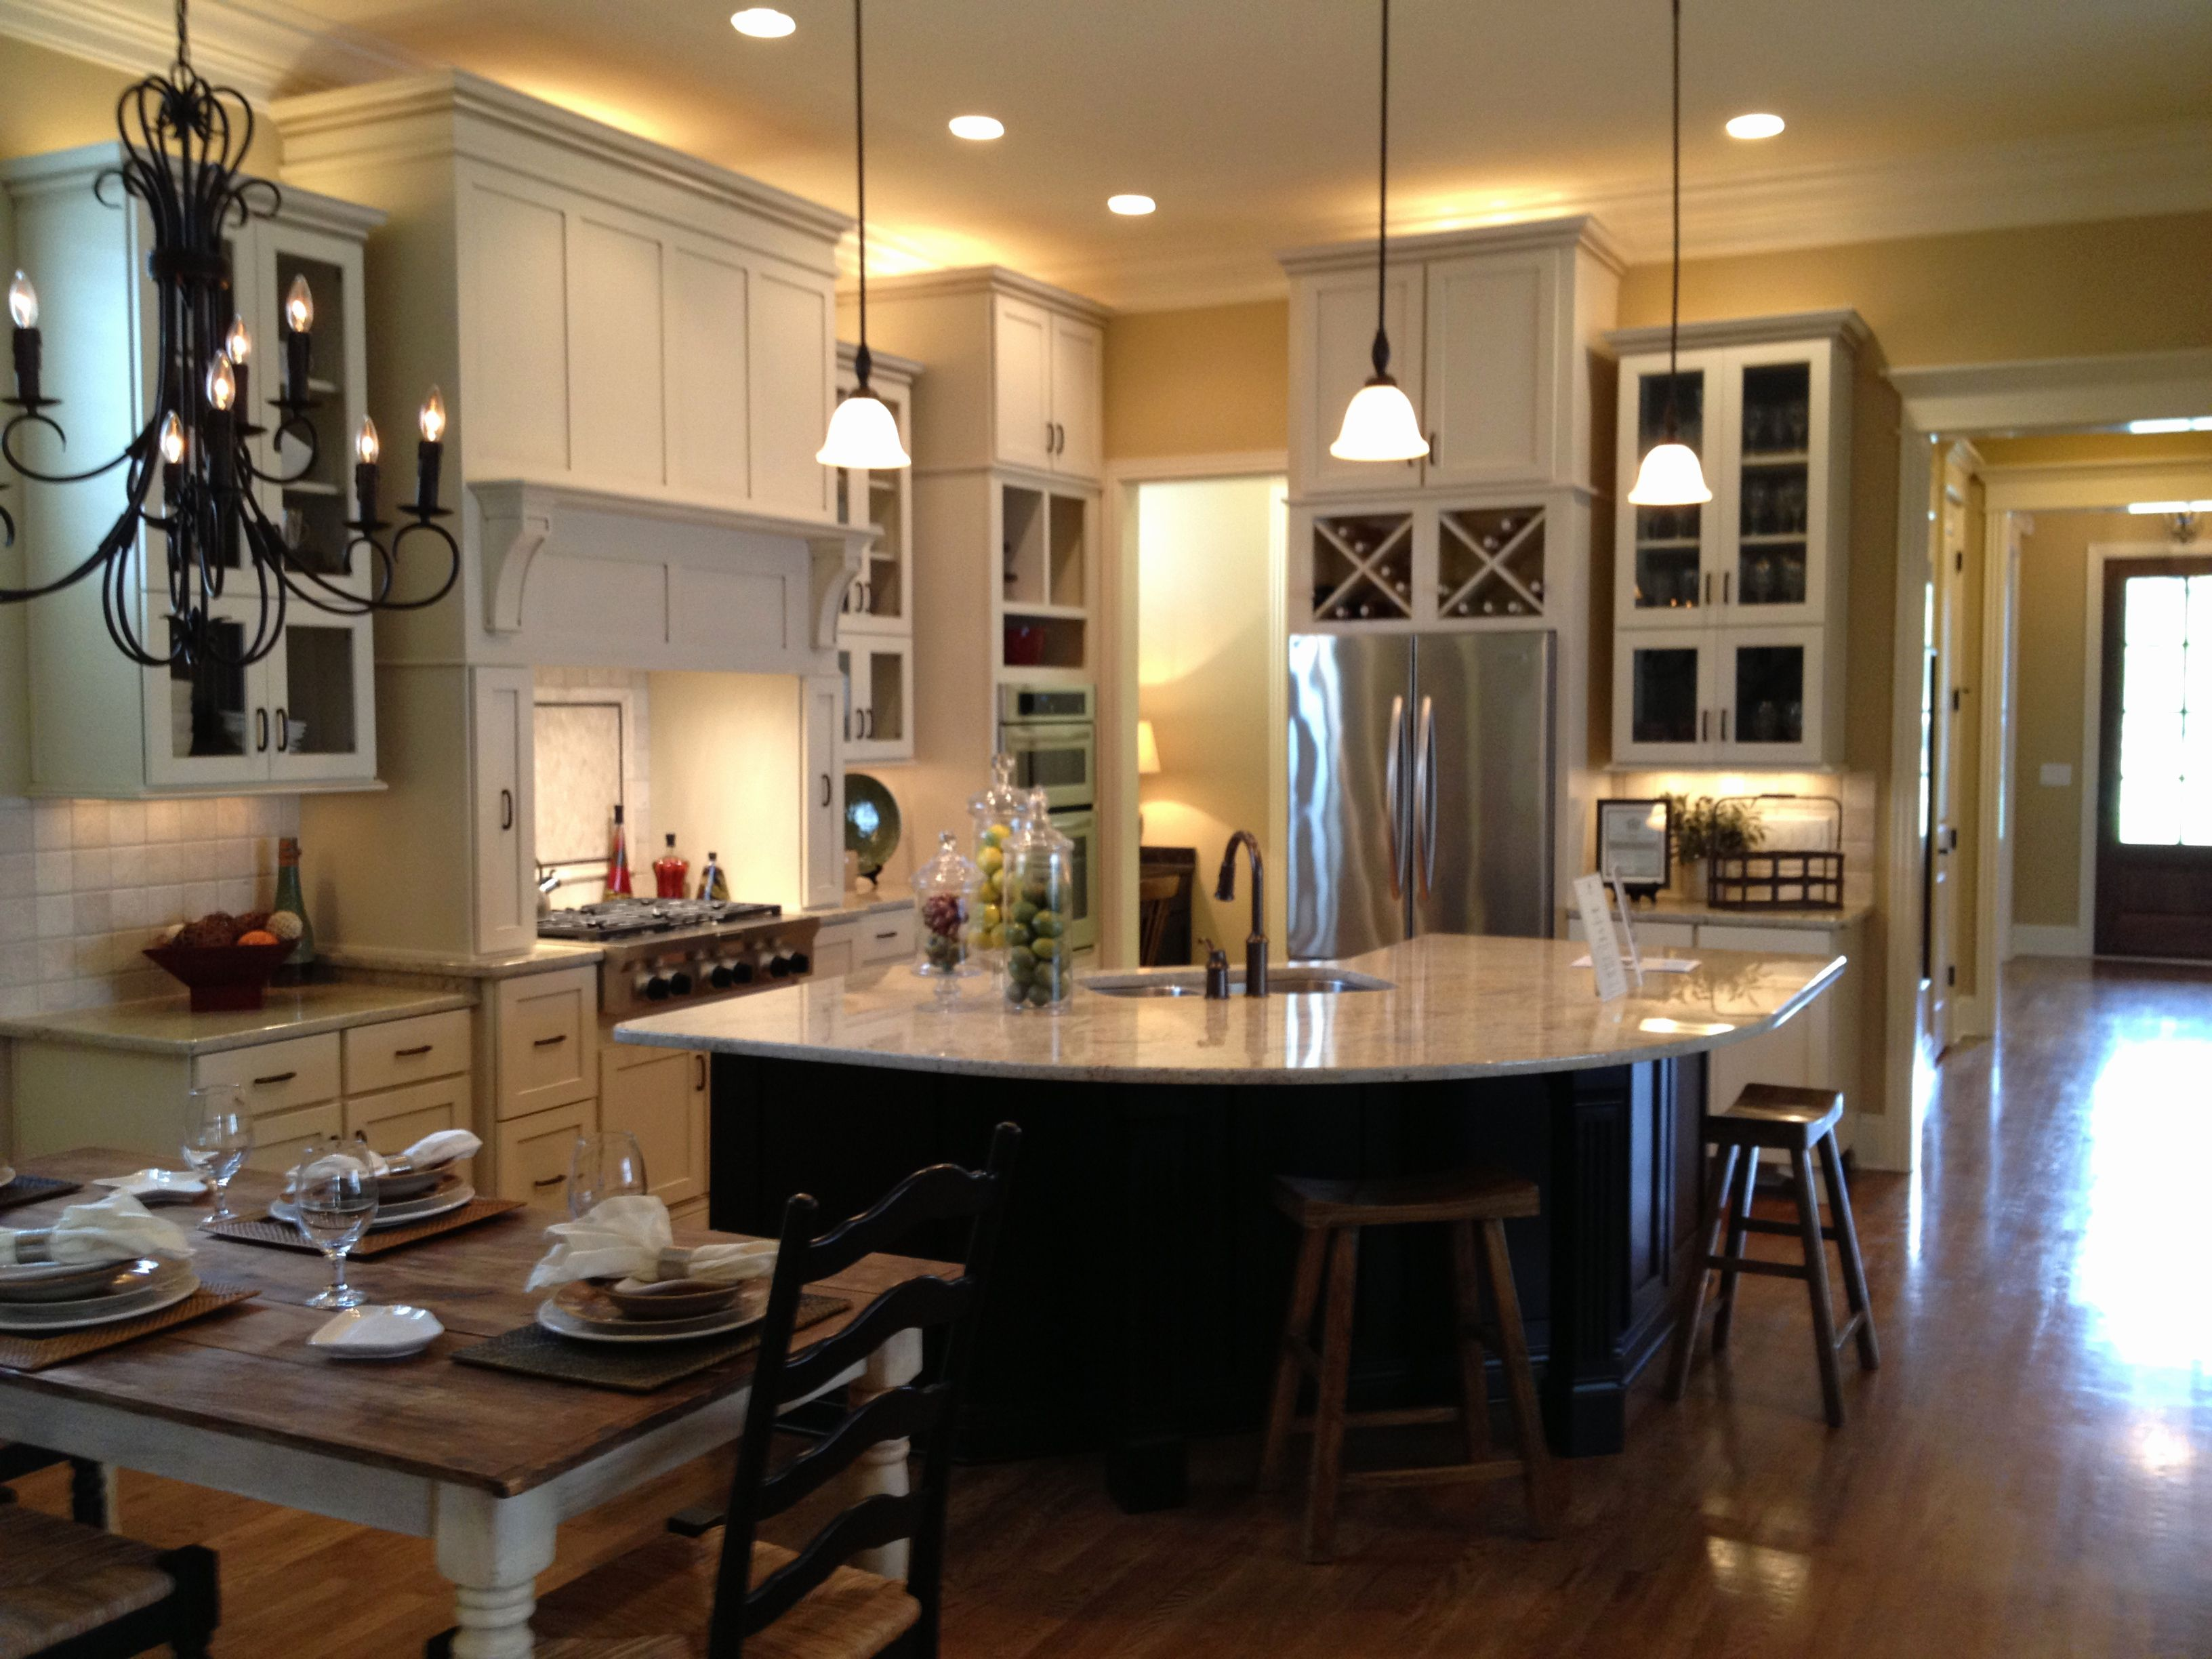 Kitchen Living Room Open Floor Plan Paint Colors Open Floor Plan Kitchen Living Room And Kitchen Design Kitchen Dining Living